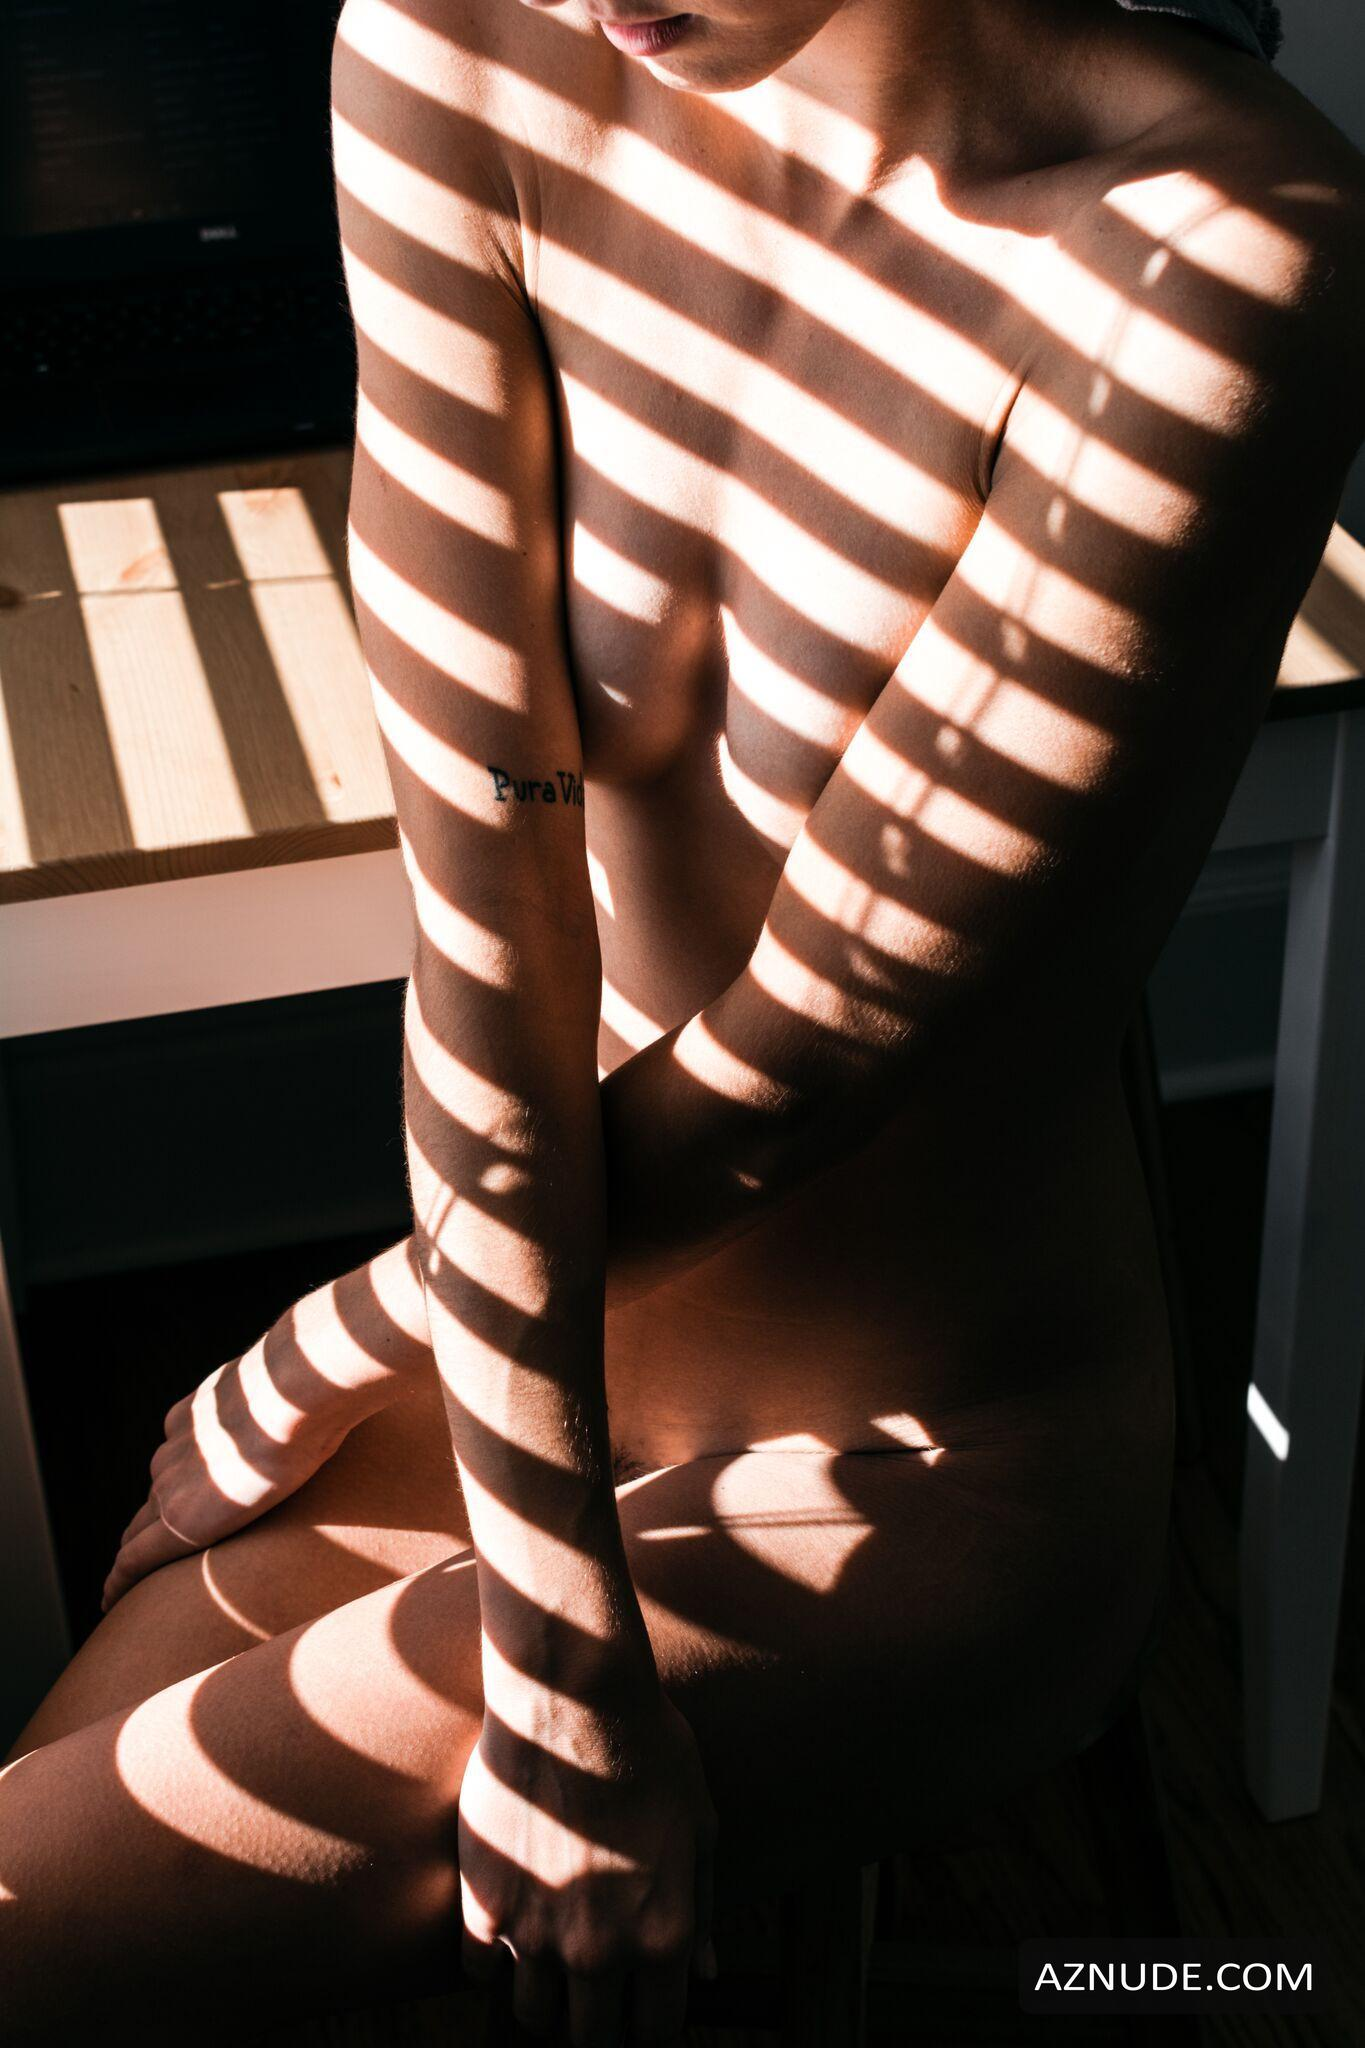 naked (54 photos), Bikini Celebrity pic